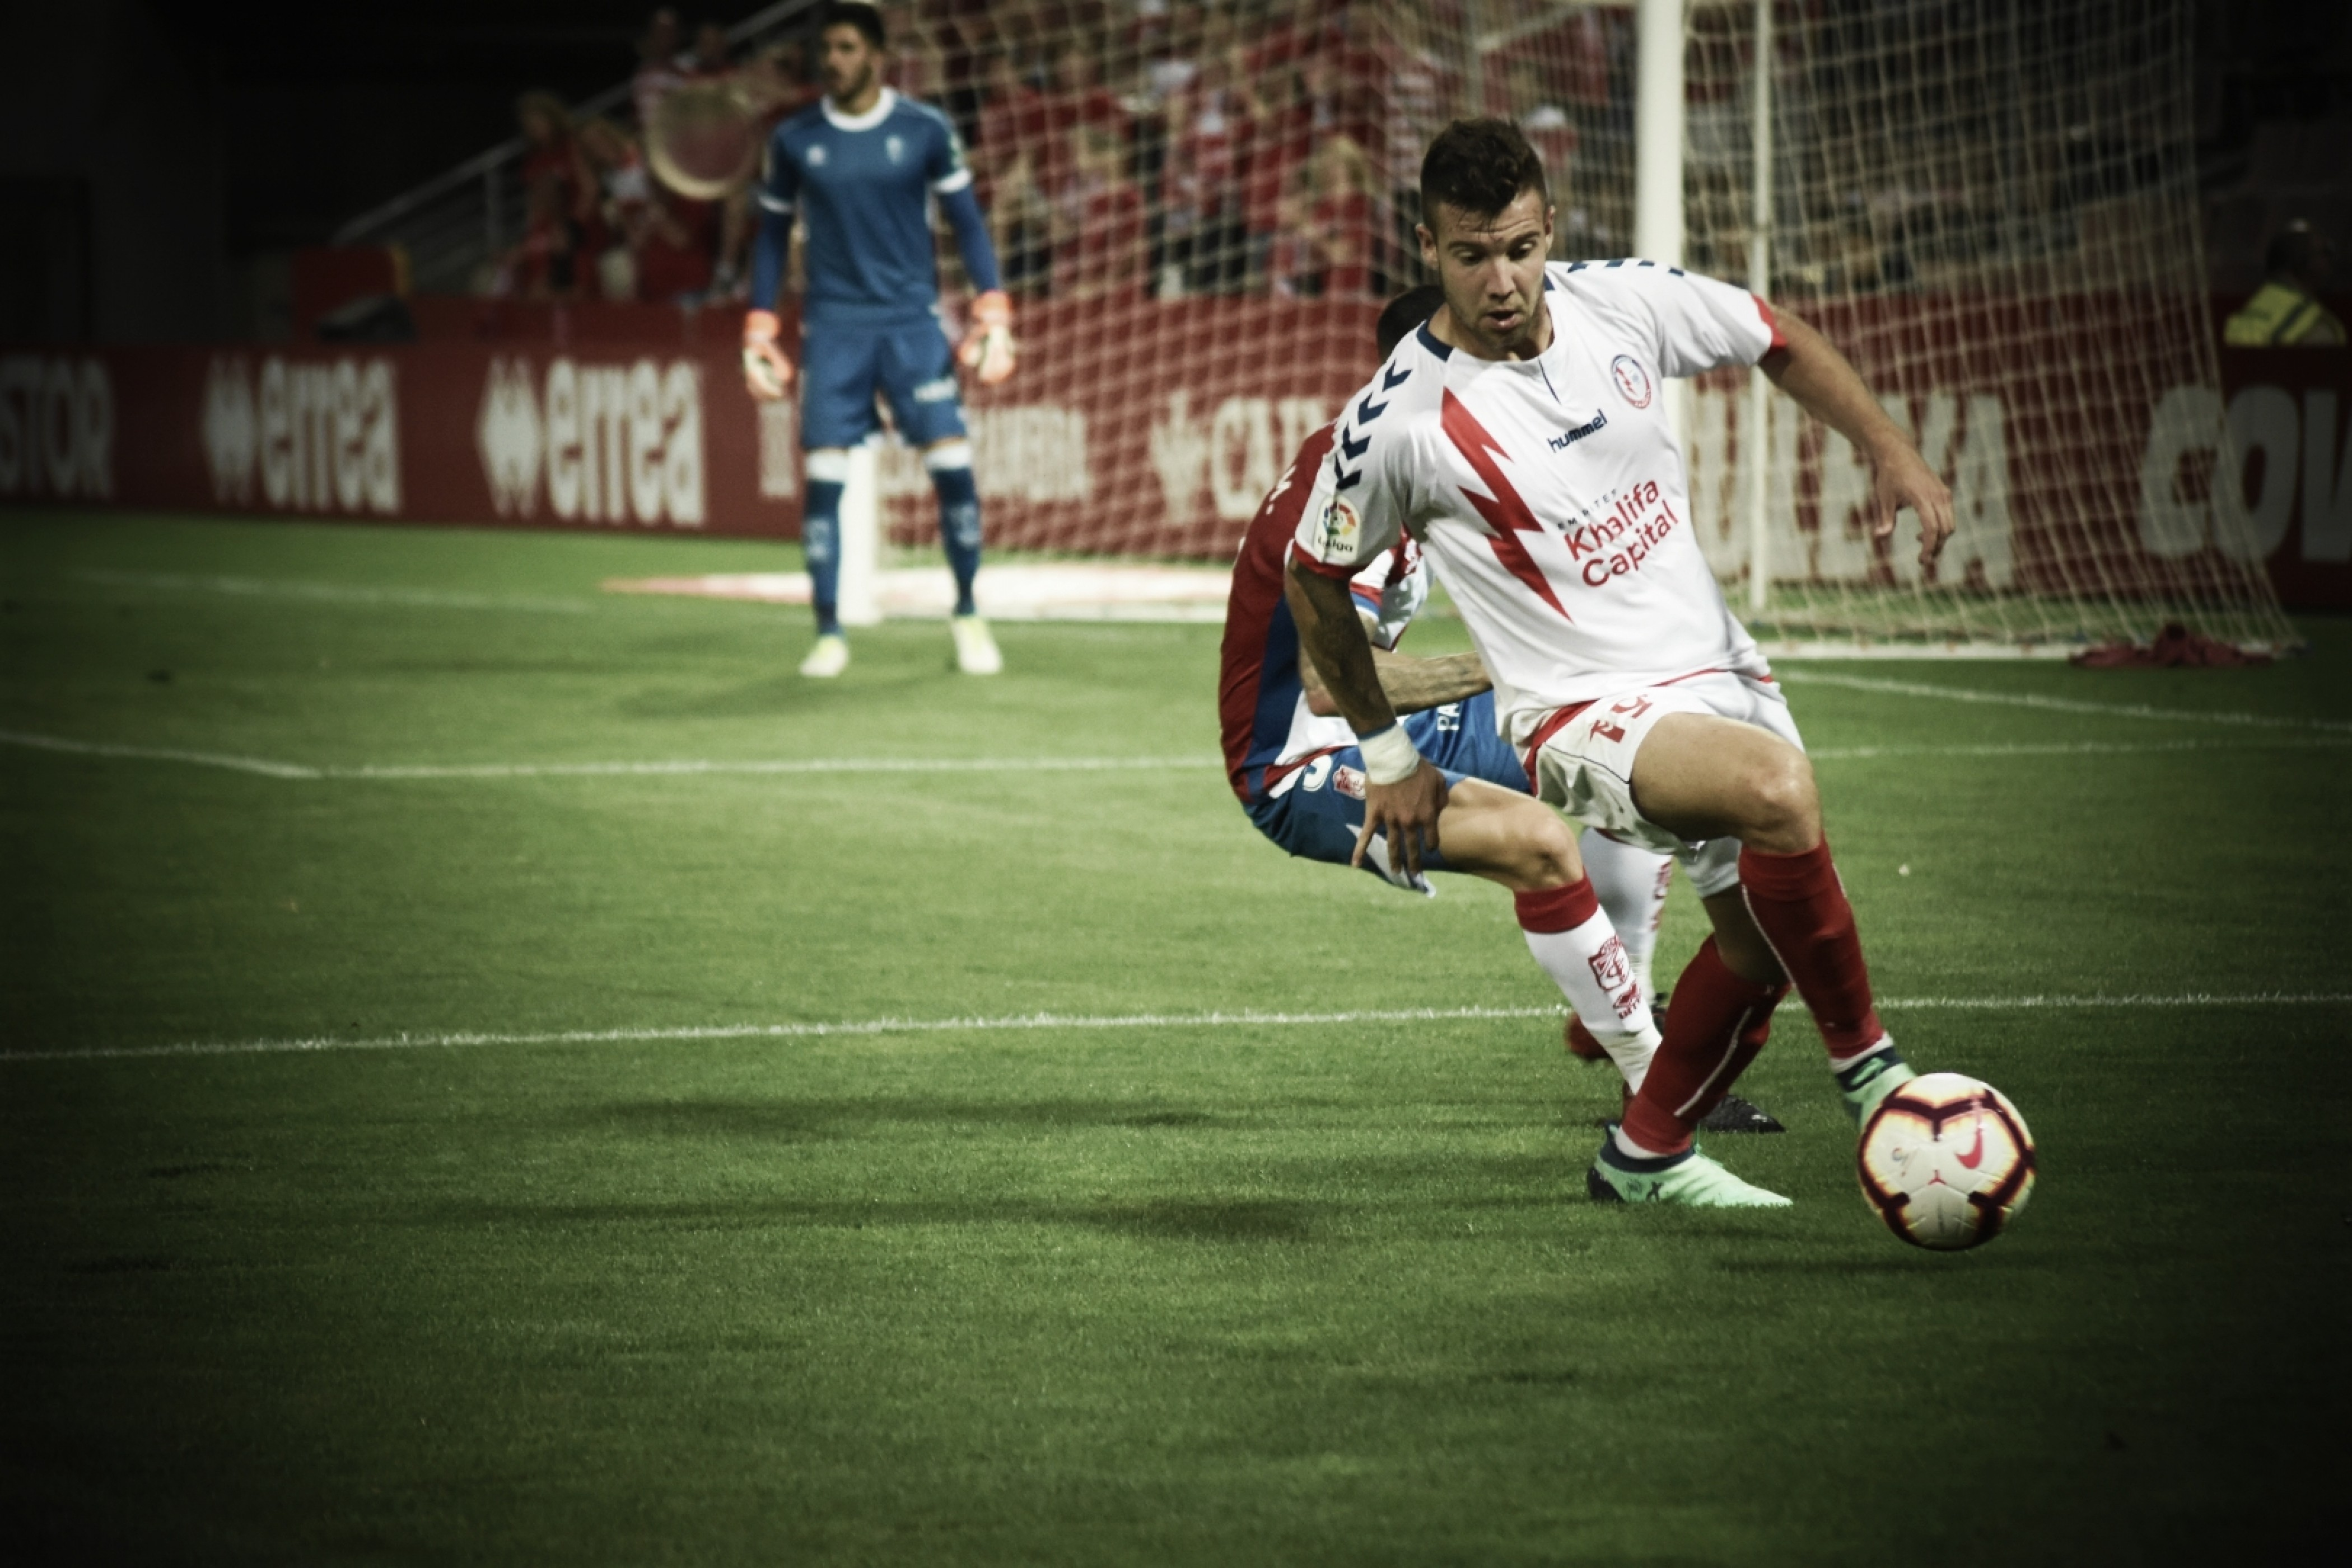 El Rayo Majadahonda cae goleado frente al Granada